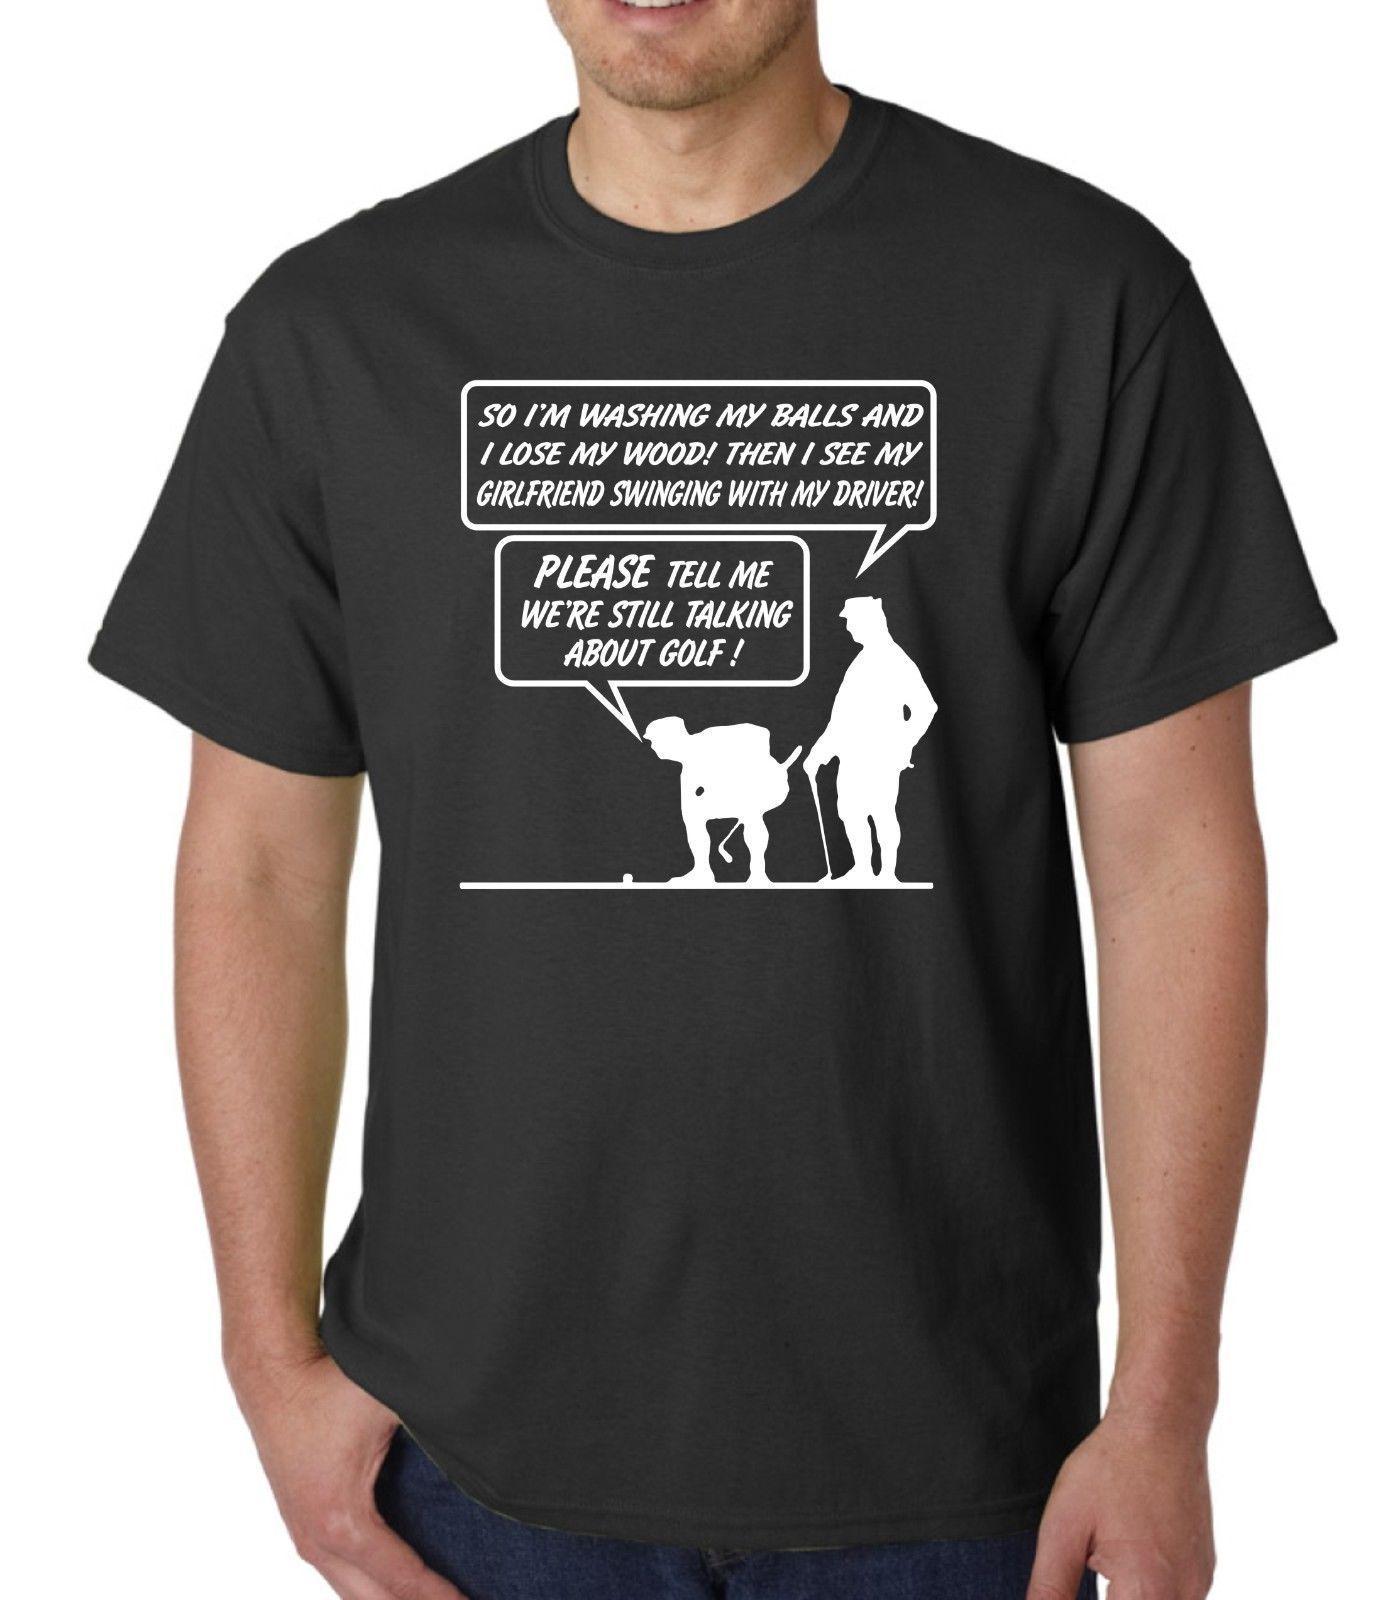 Print T-Shirt Men Summer top tee golfed slogan funny slogan t shirt or hoody various colours